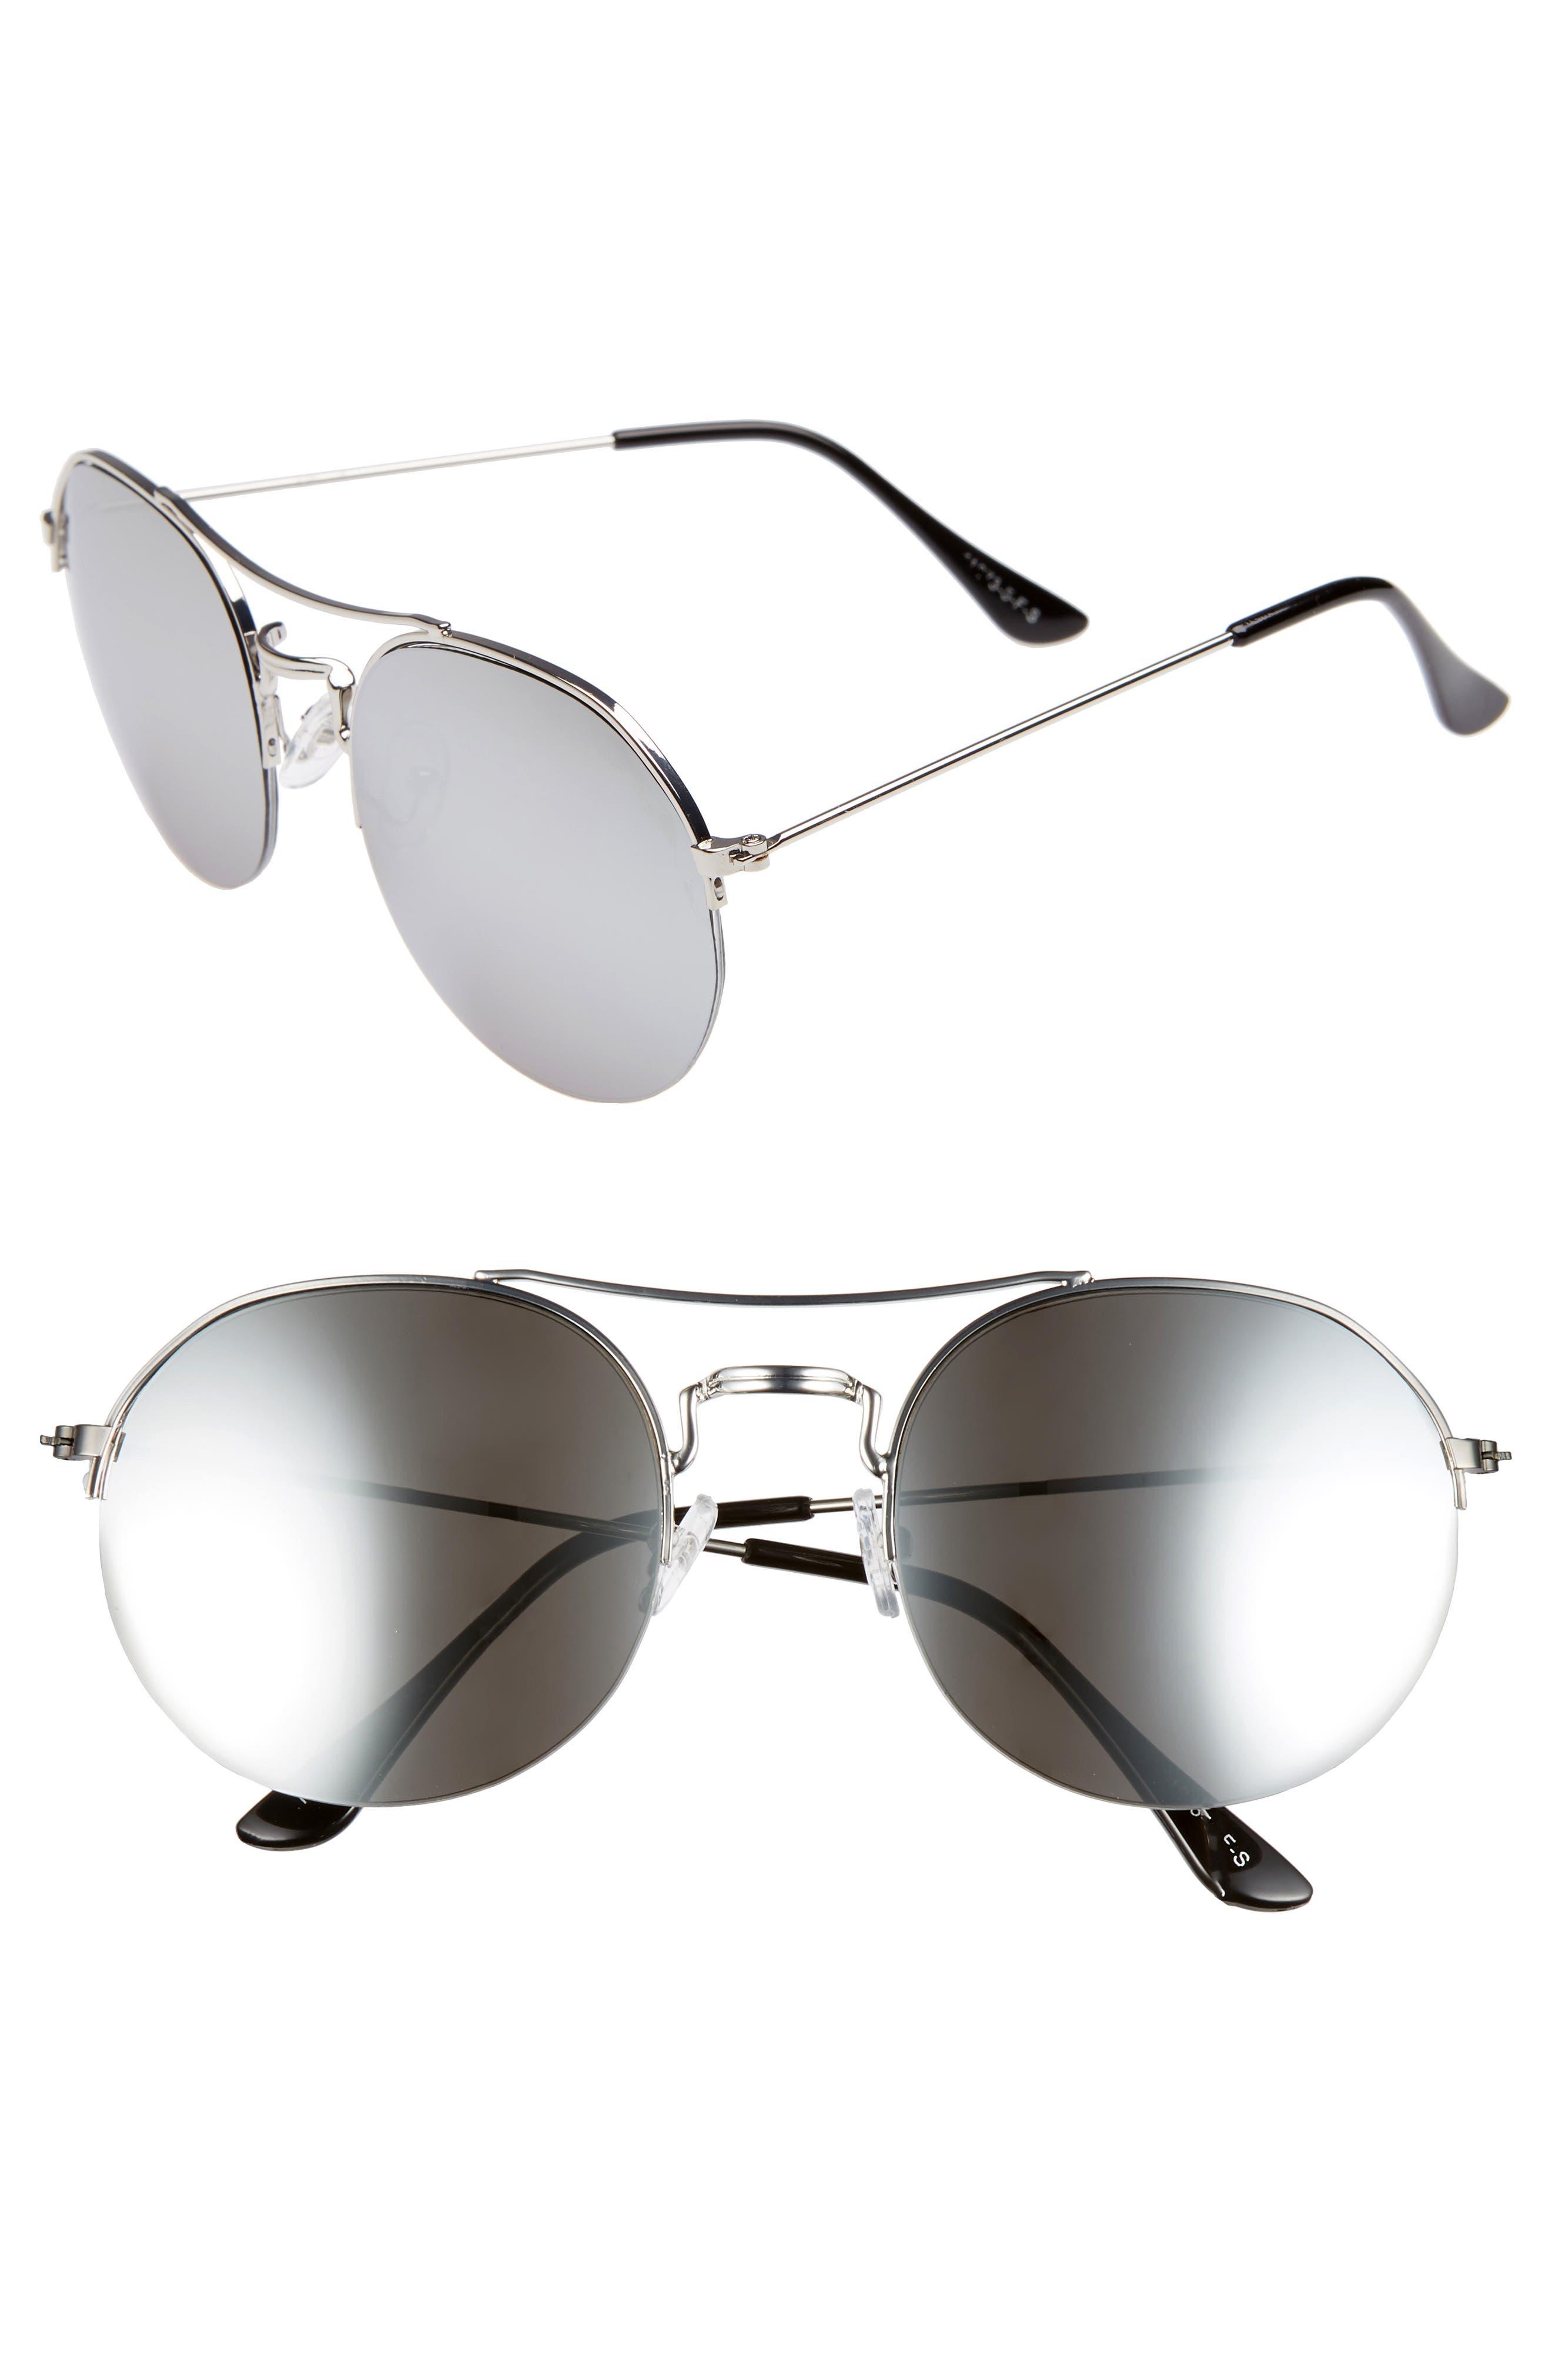 55mm Round Metal Aviator Sunglasses,                             Main thumbnail 1, color,                             DARK GREY